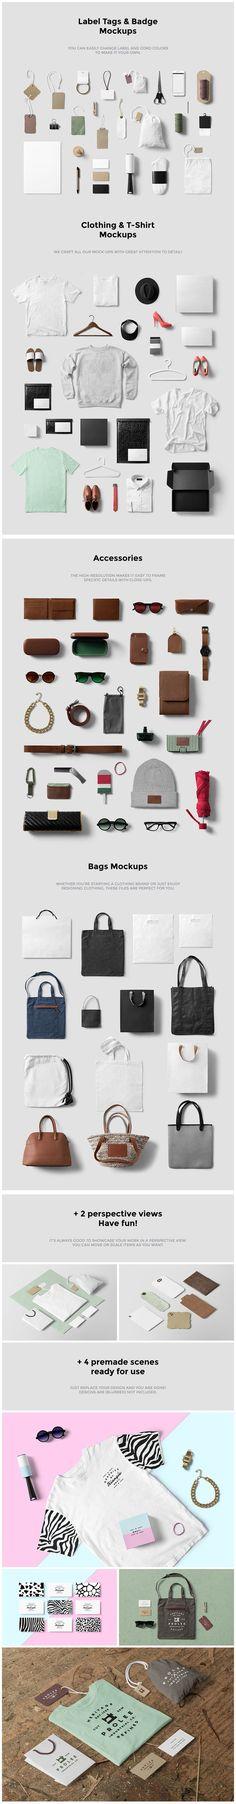 Clothing, Fashion & T-Shirt Mockups https://www.designcuts.com/product/clothing-fashion-t-shirt-mockups/